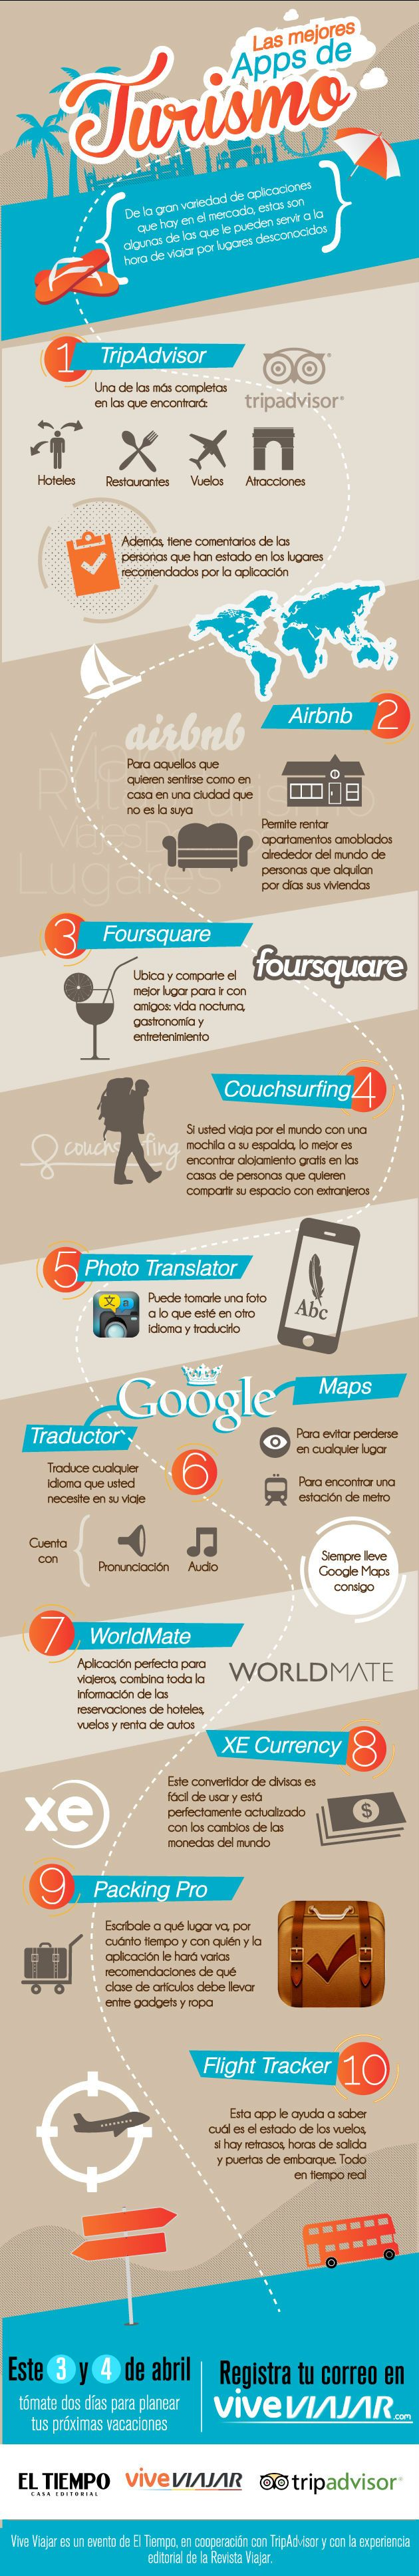 Las mejores APPs de turismo #infografia